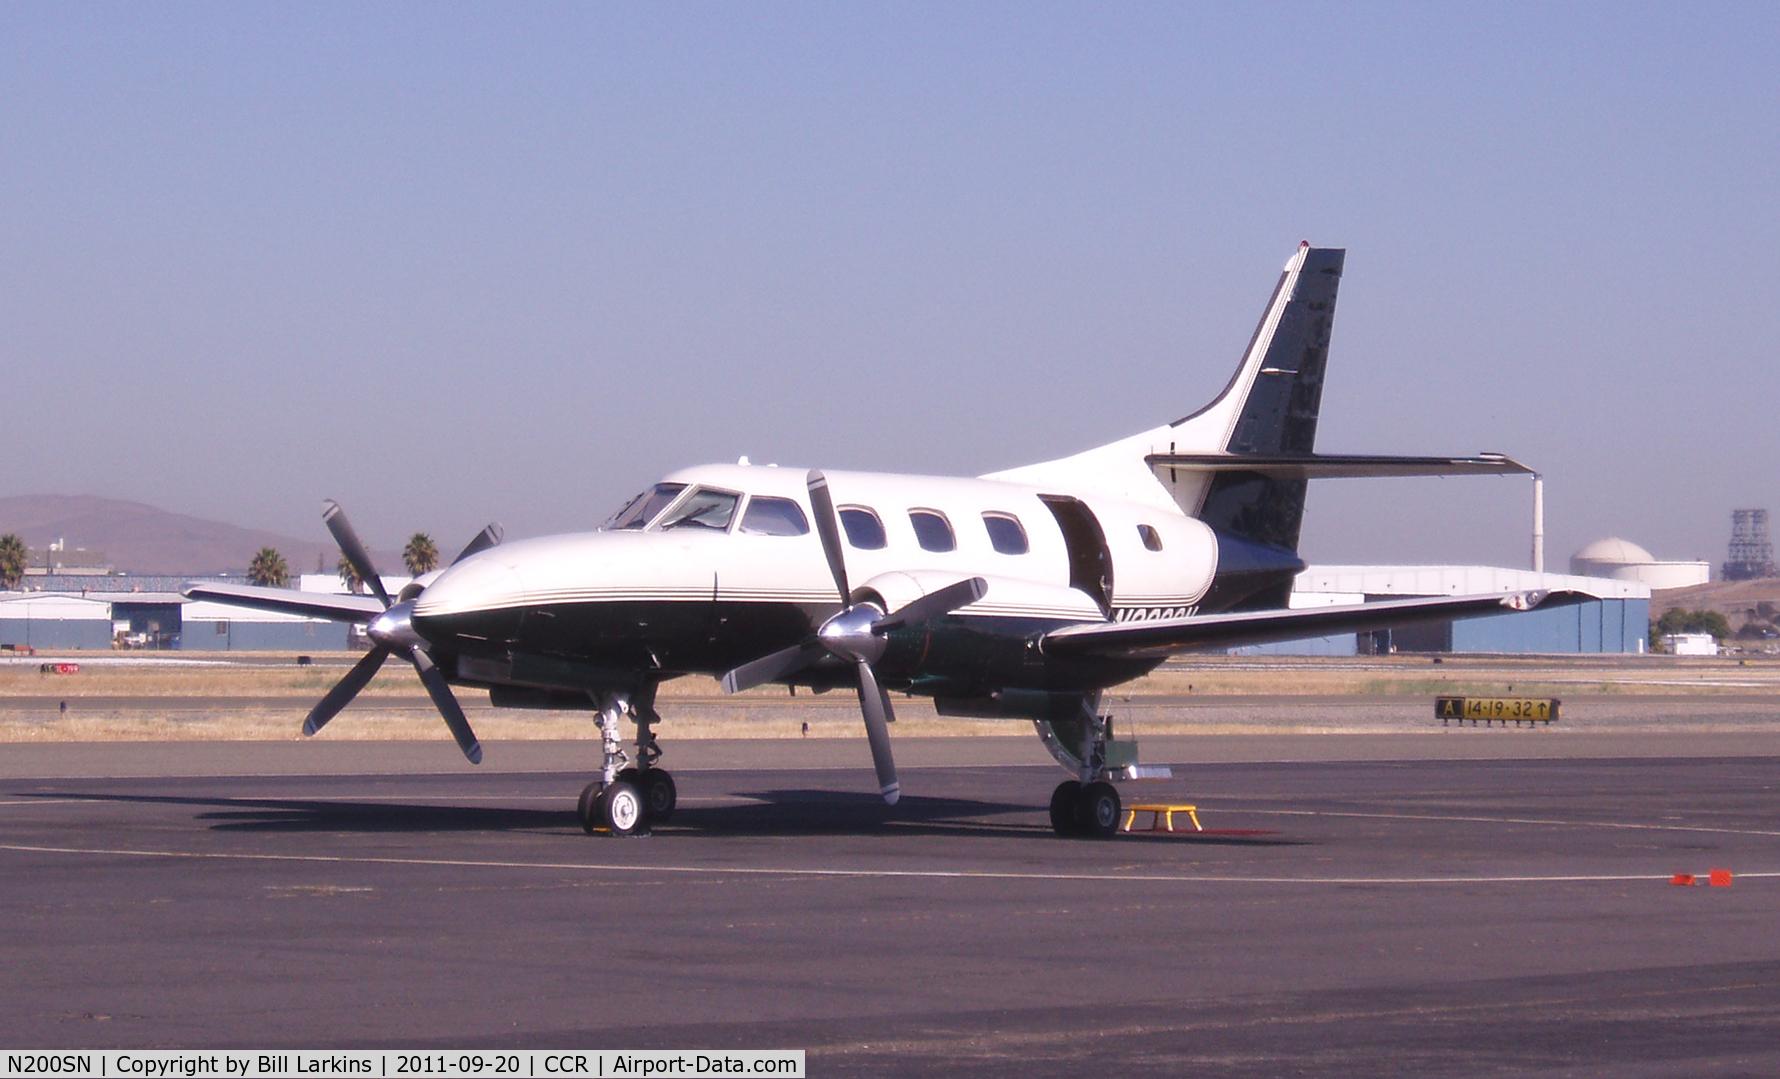 N200SN, 1980 Swearingen SA226-T(B) C/N T-354, Visitor